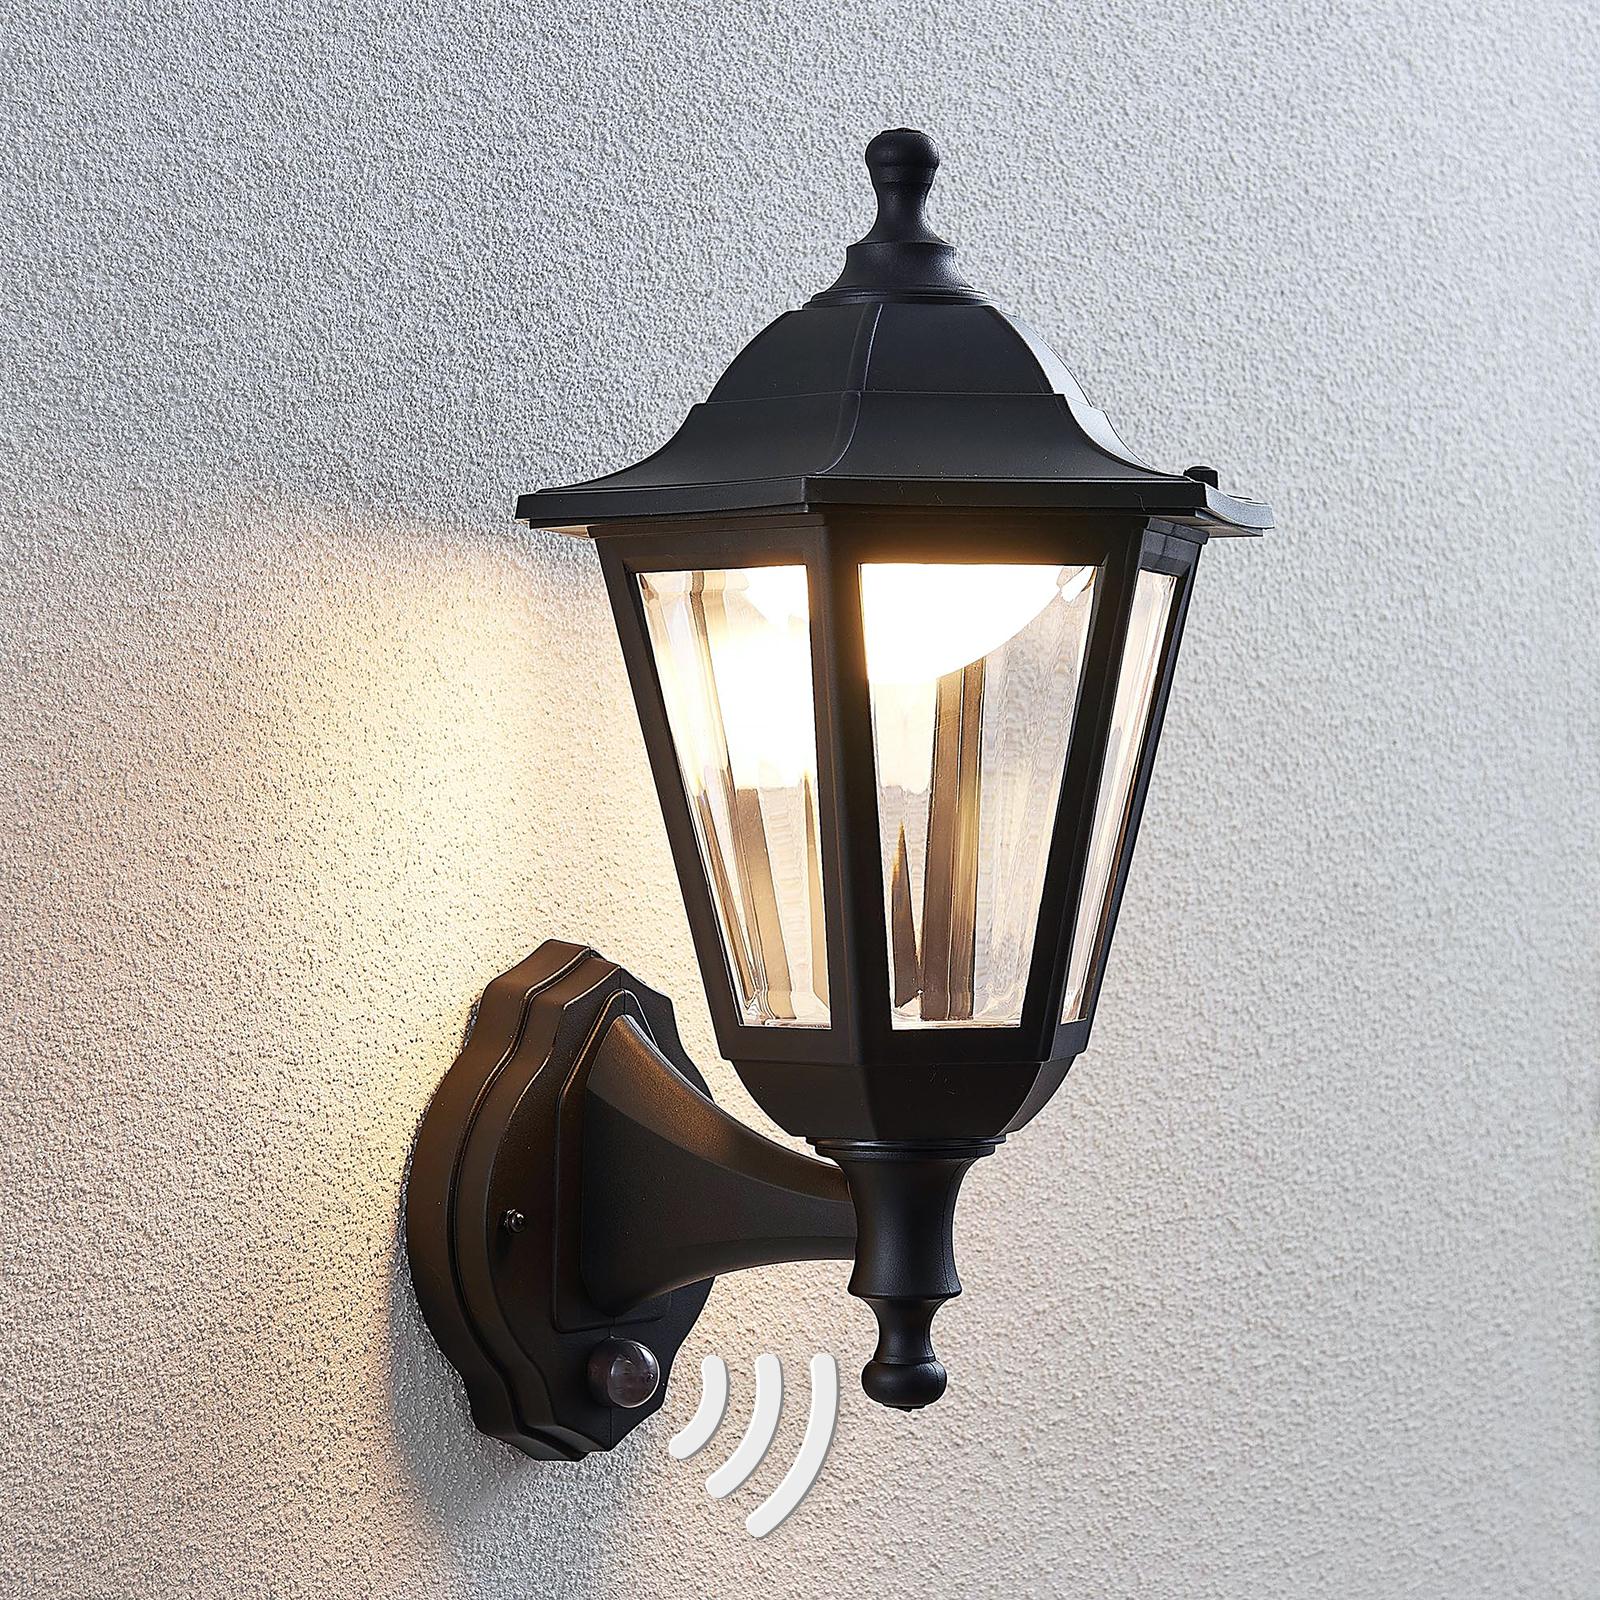 LED-ulkoseinälamppu Iavo, anturi